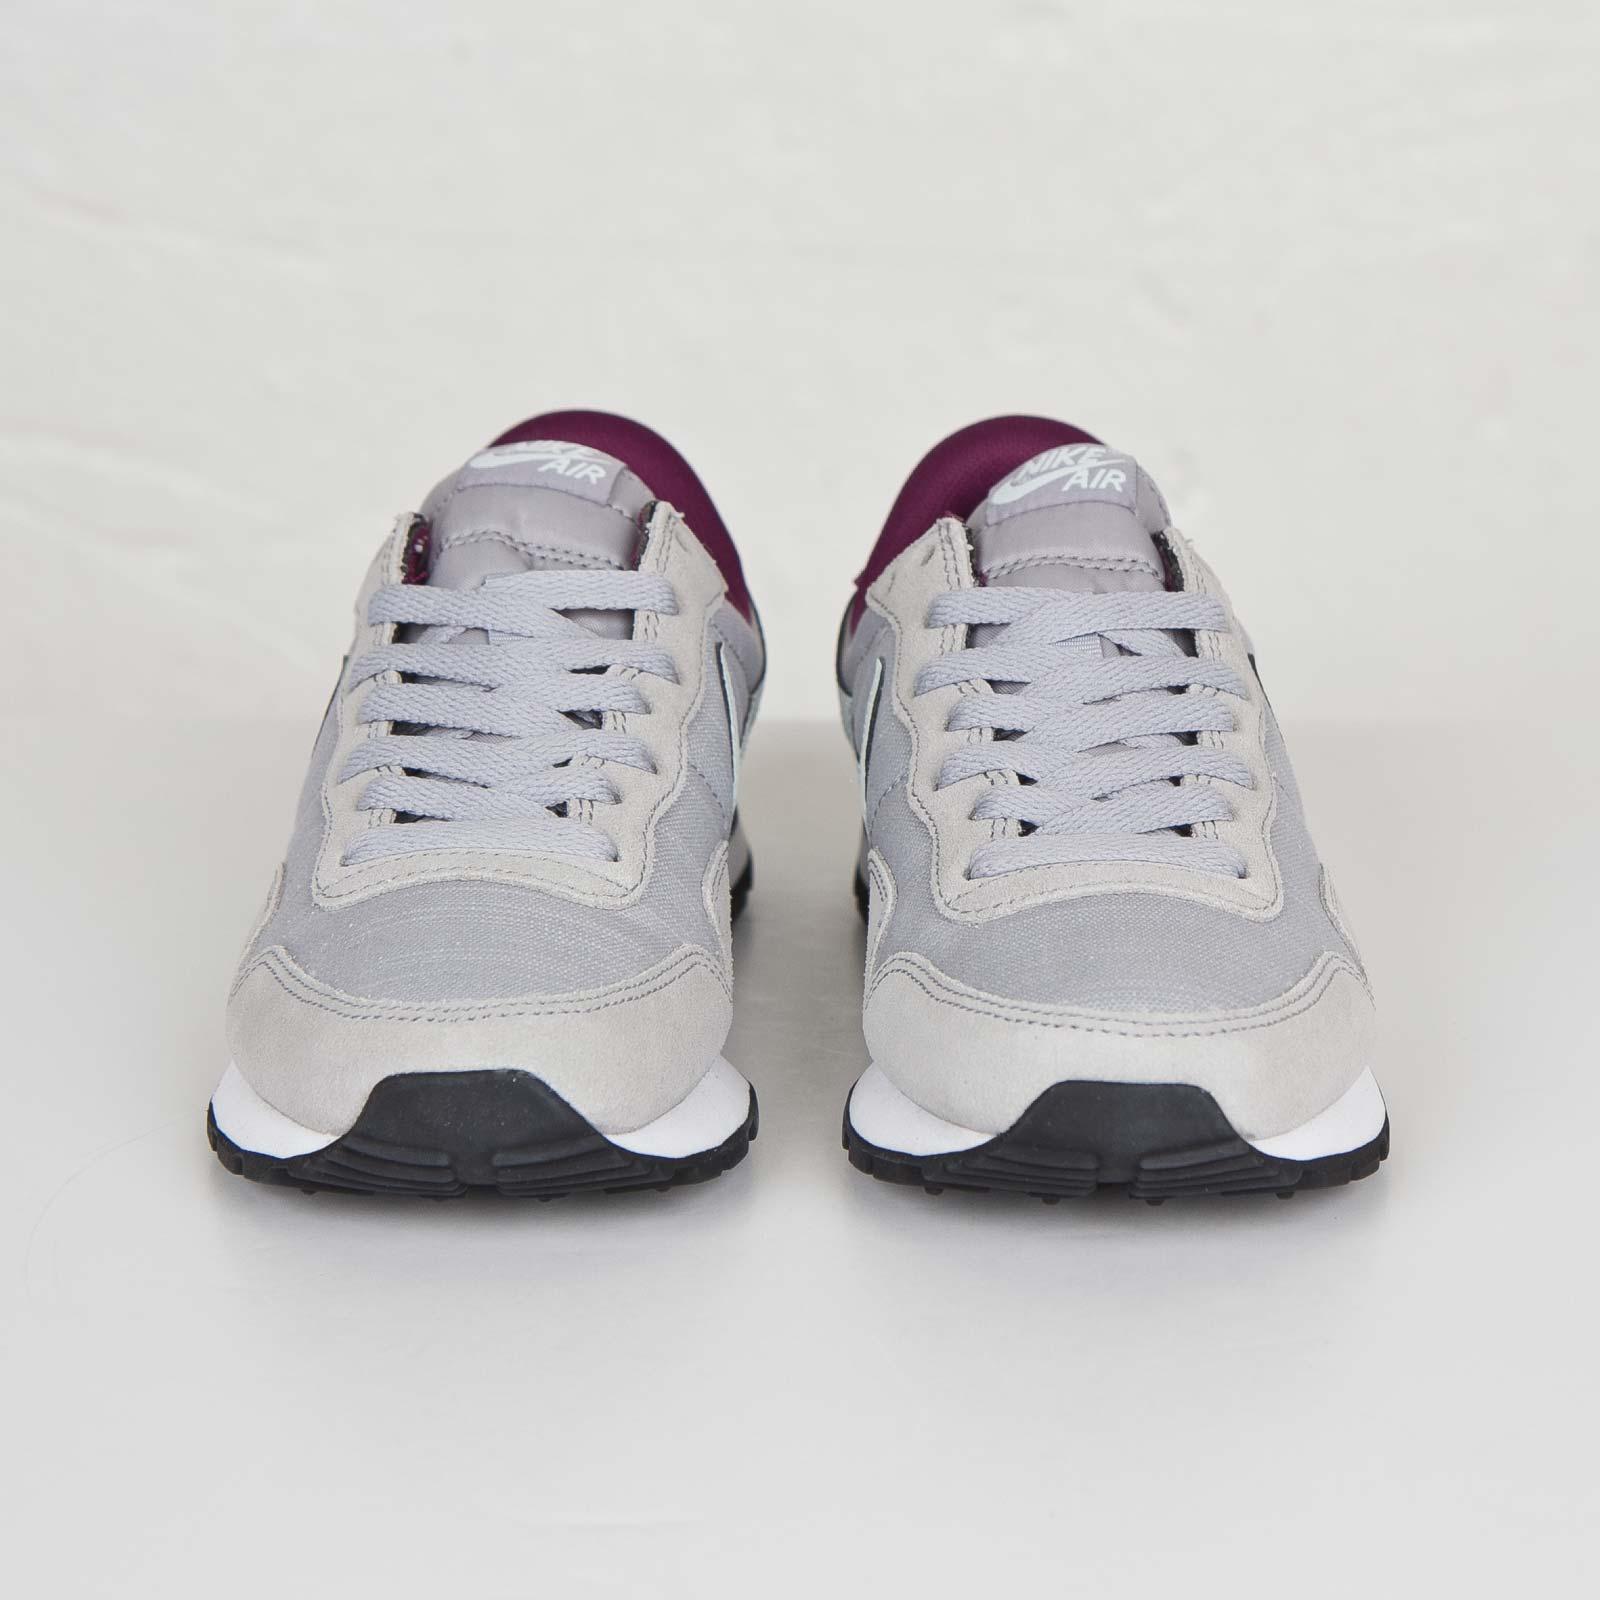 84f6c2ce9739e Nike Wmns Air Pegasus 83 - 407477-013 - Sneakersnstuff